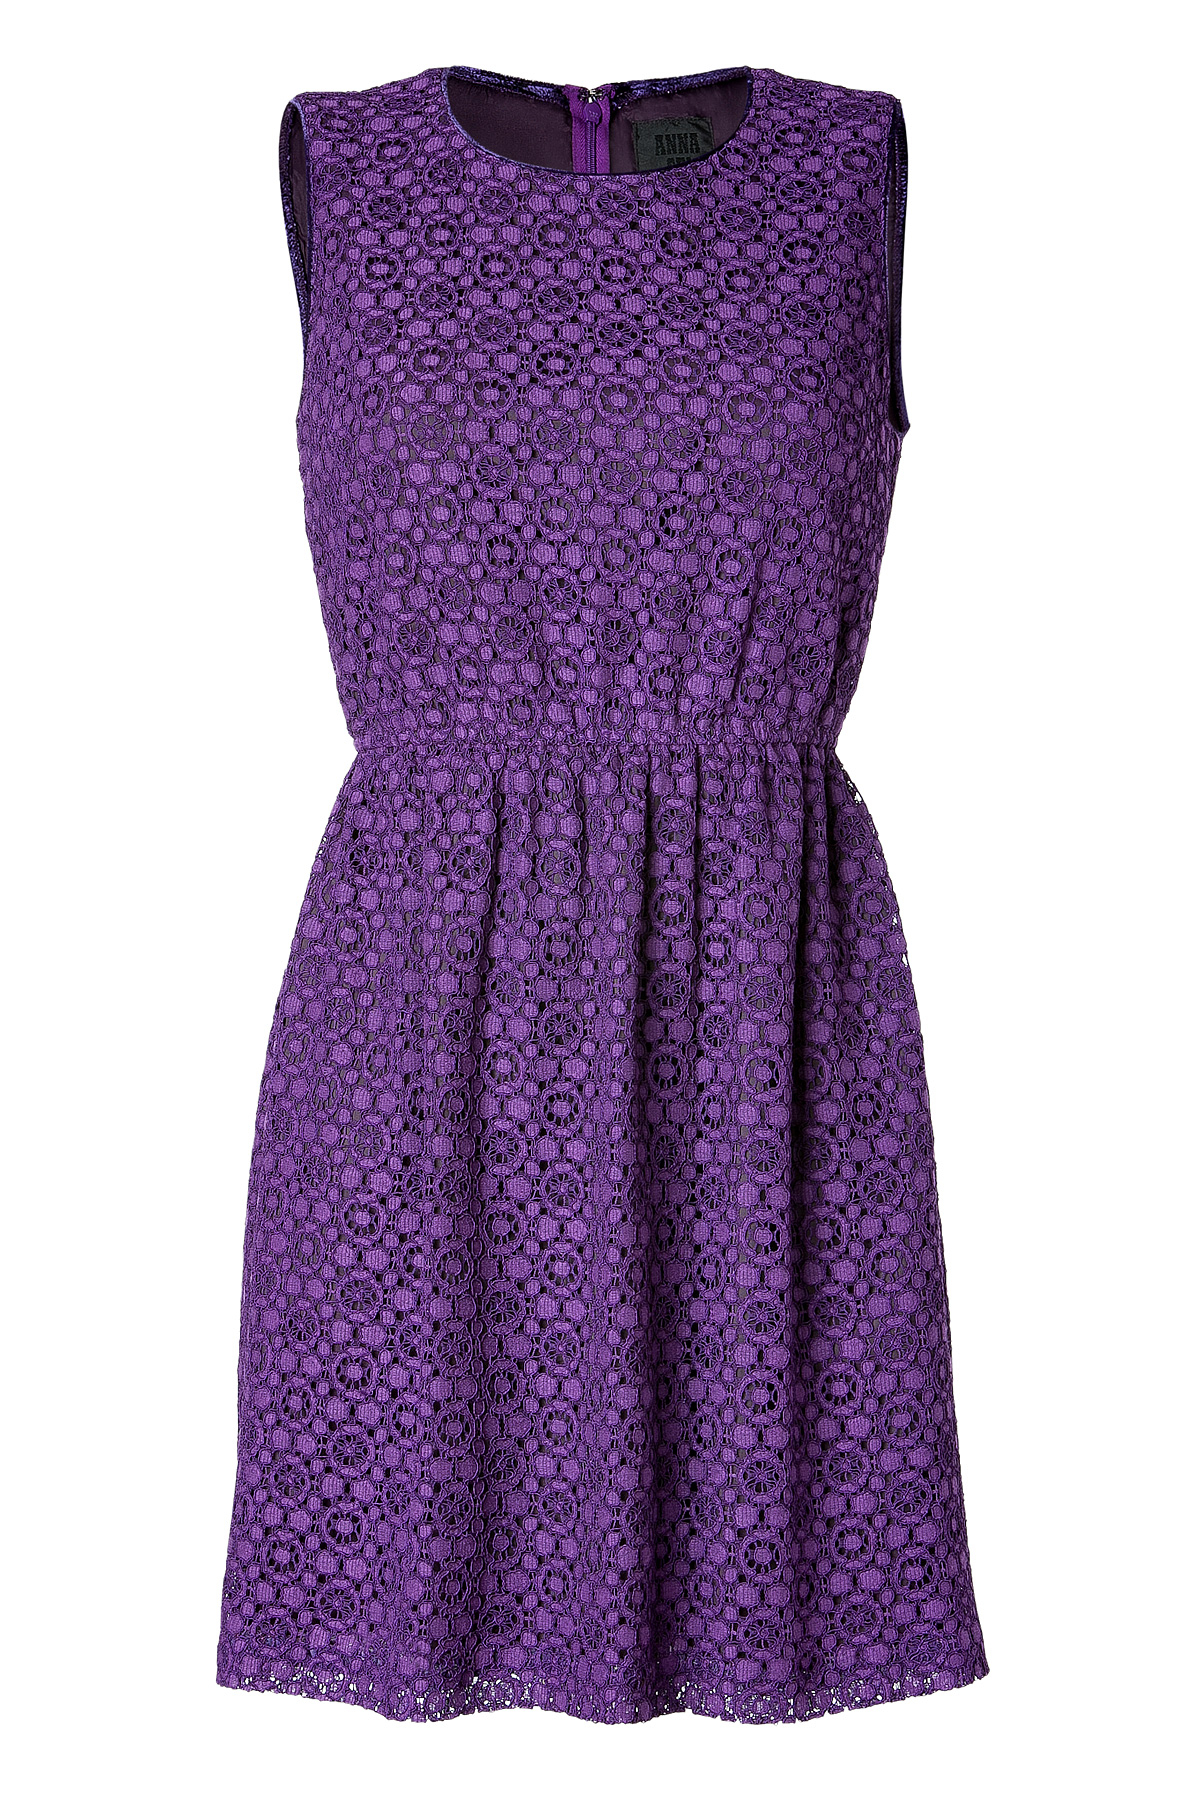 Anna Sui Fashion Purple Black